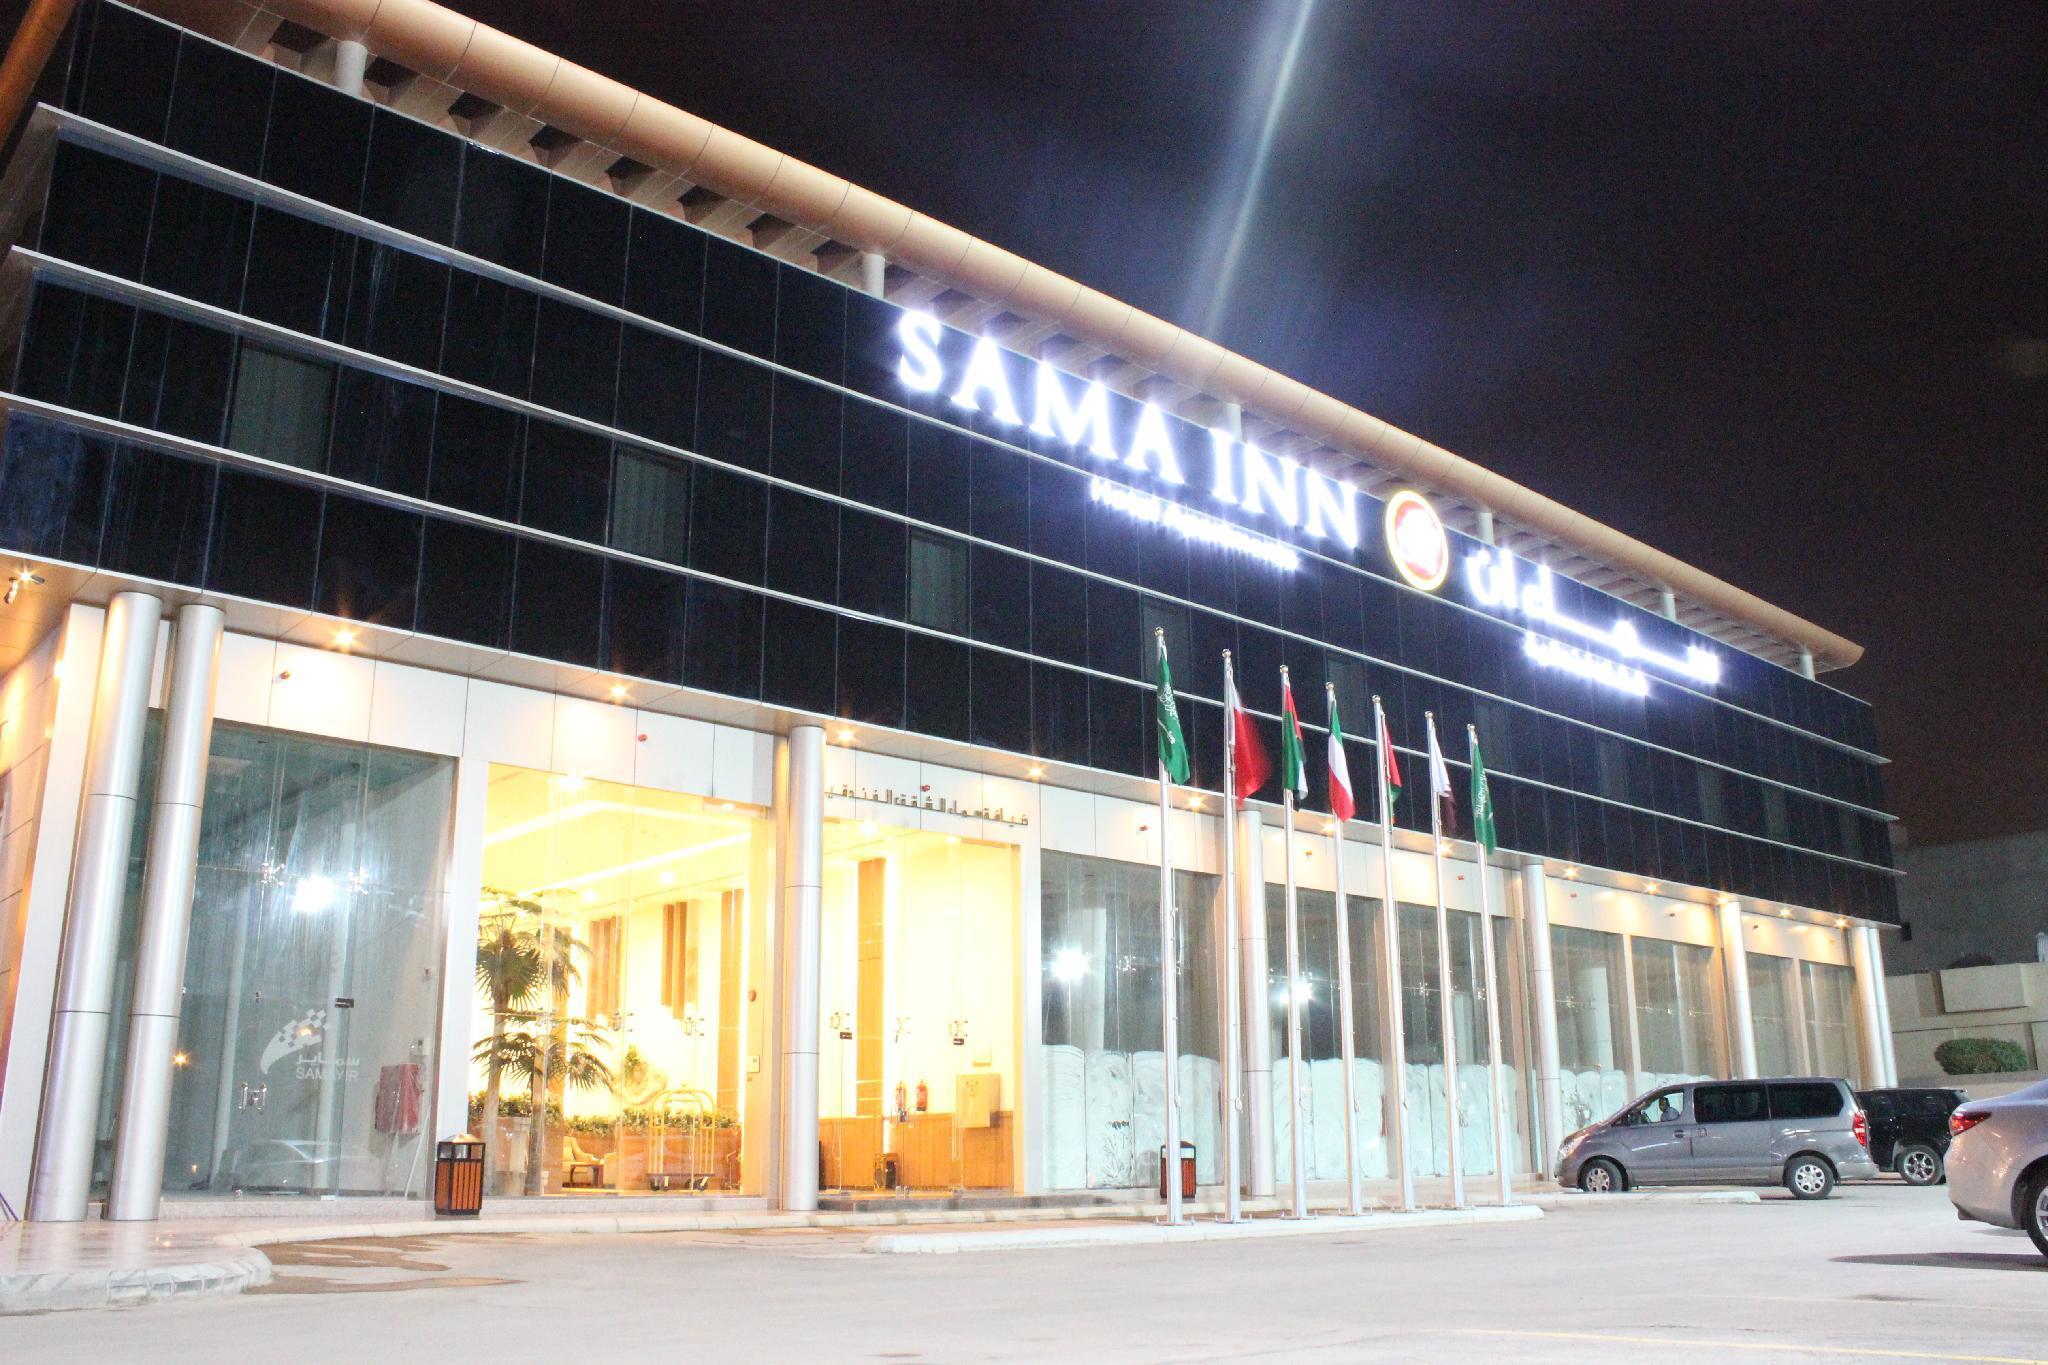 Sama Inn Hotel Riyadh Saudi Arabia